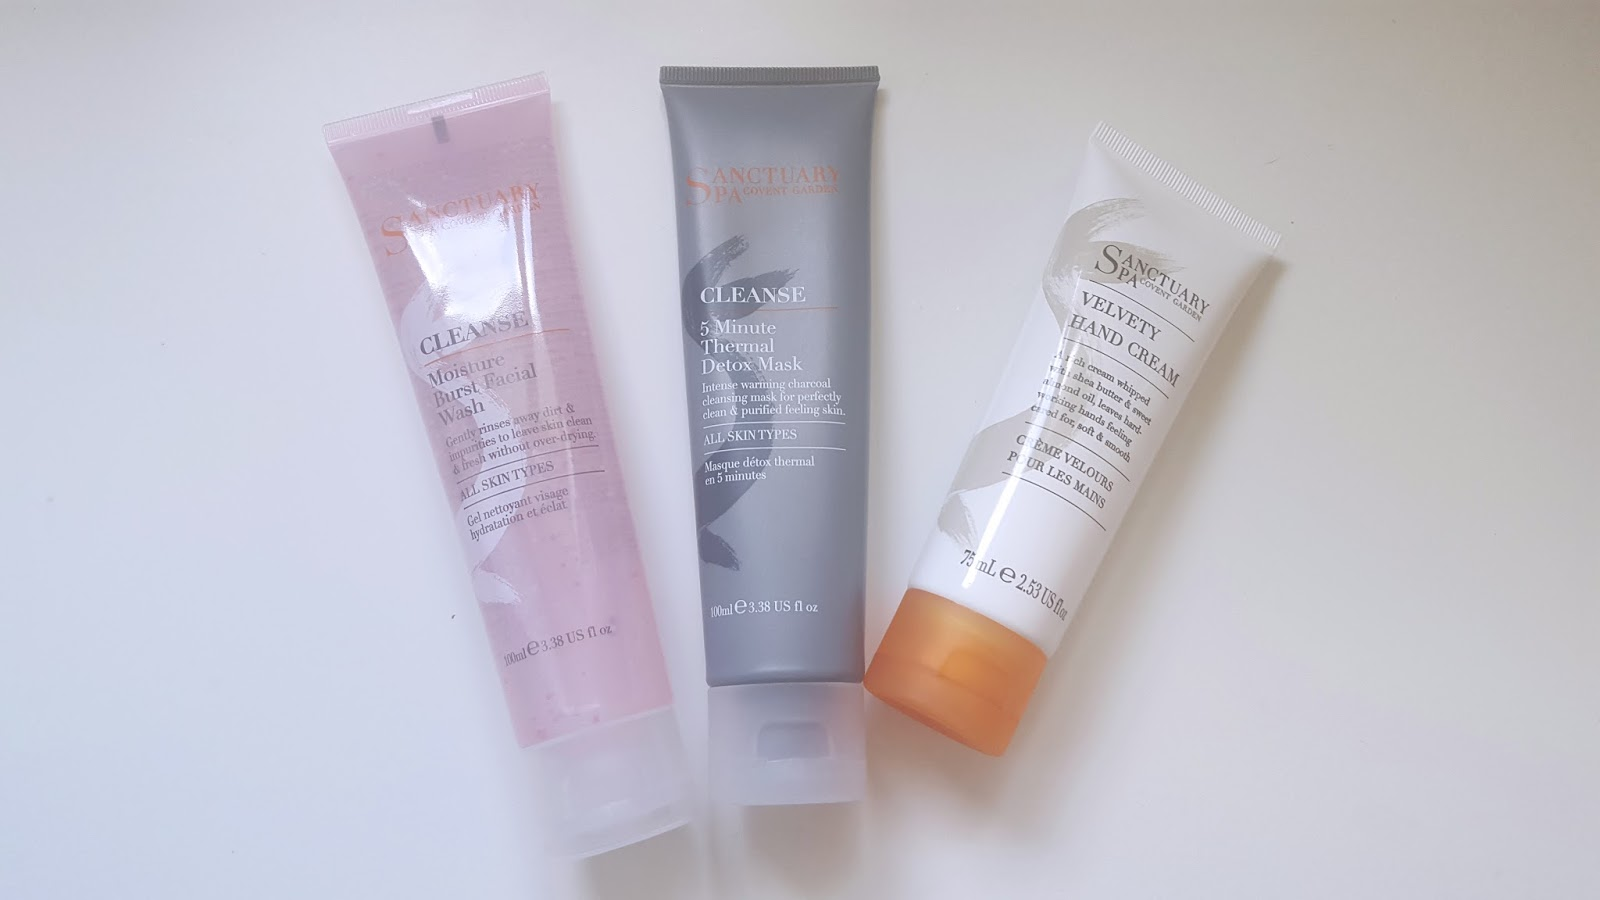 Sanctuary Spa Moisture Burst Facial Wash 5 Minute Theraml Detox Mask Velvety Hand Cream